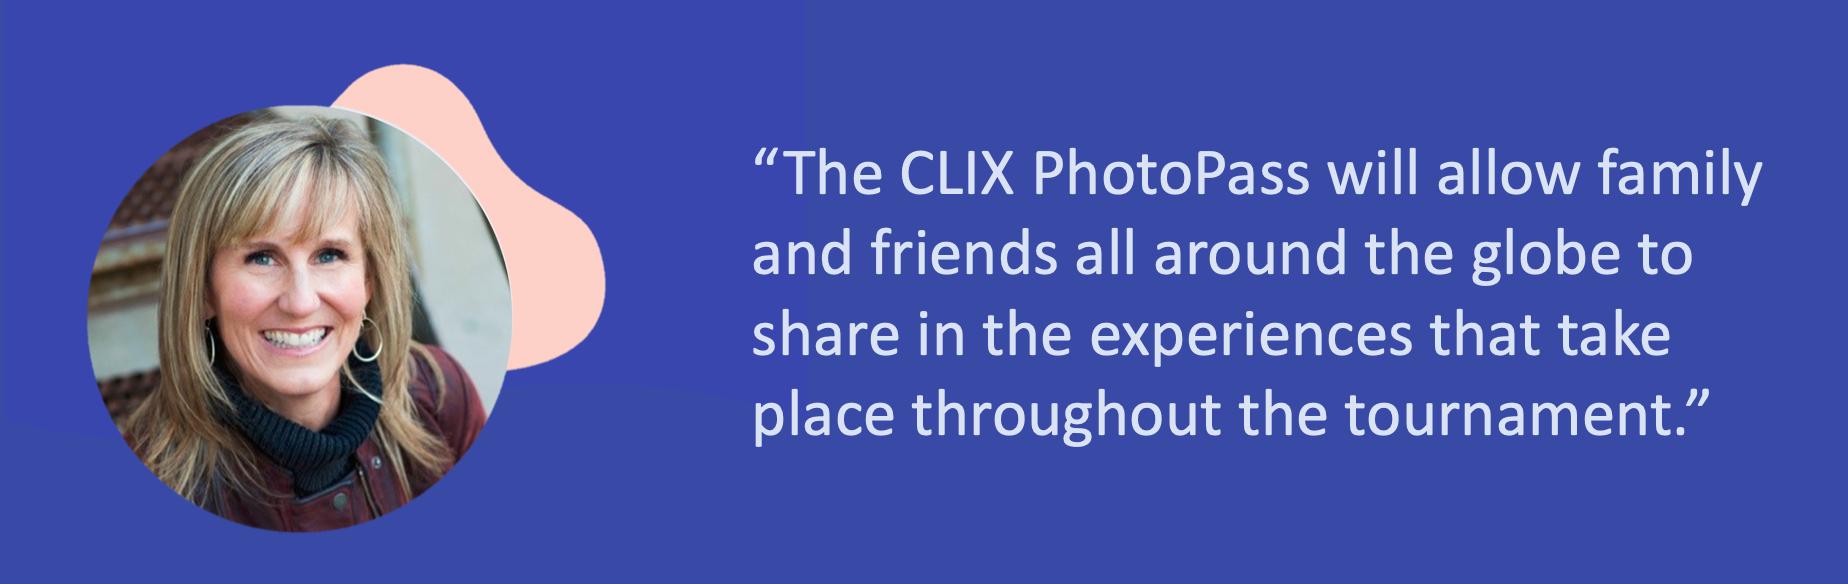 Clix Quote